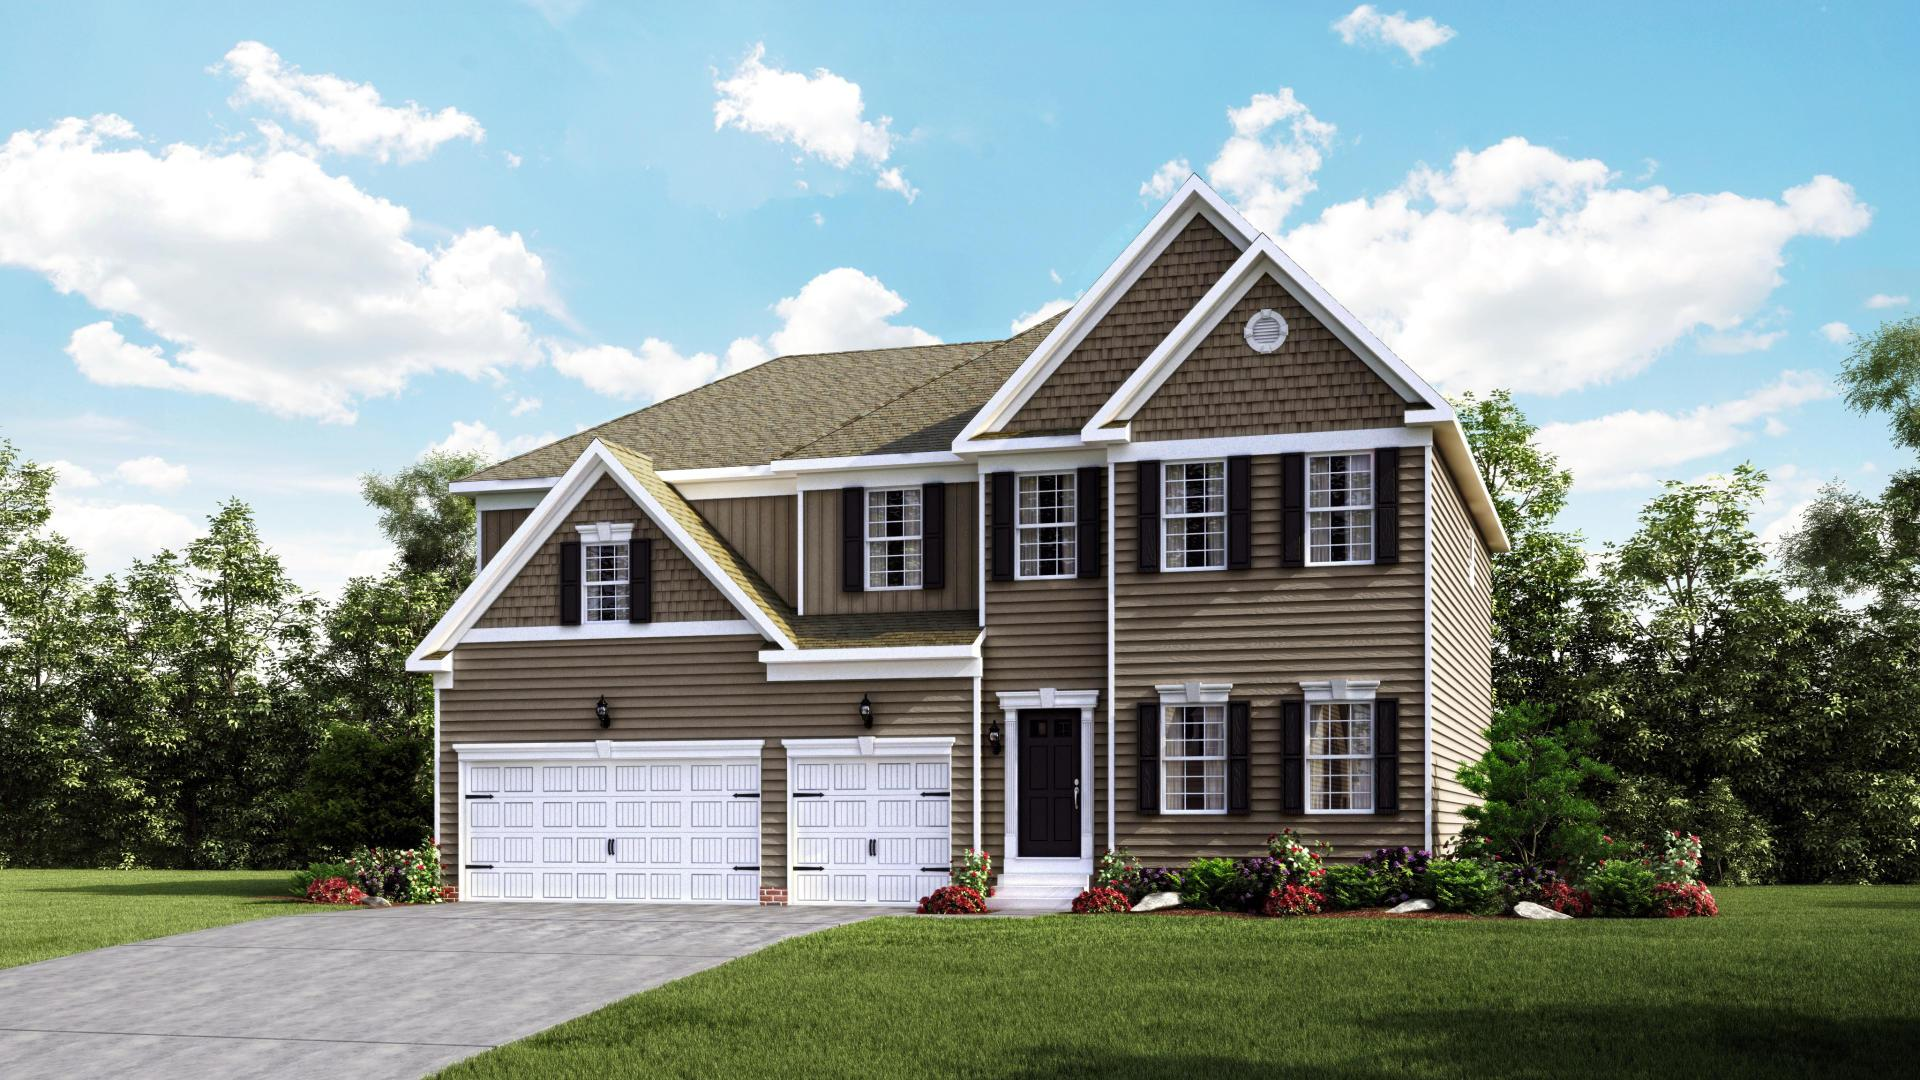 Exterior:Elevation: H Siding Facade Opt 3-Car Garage & Garage Doors